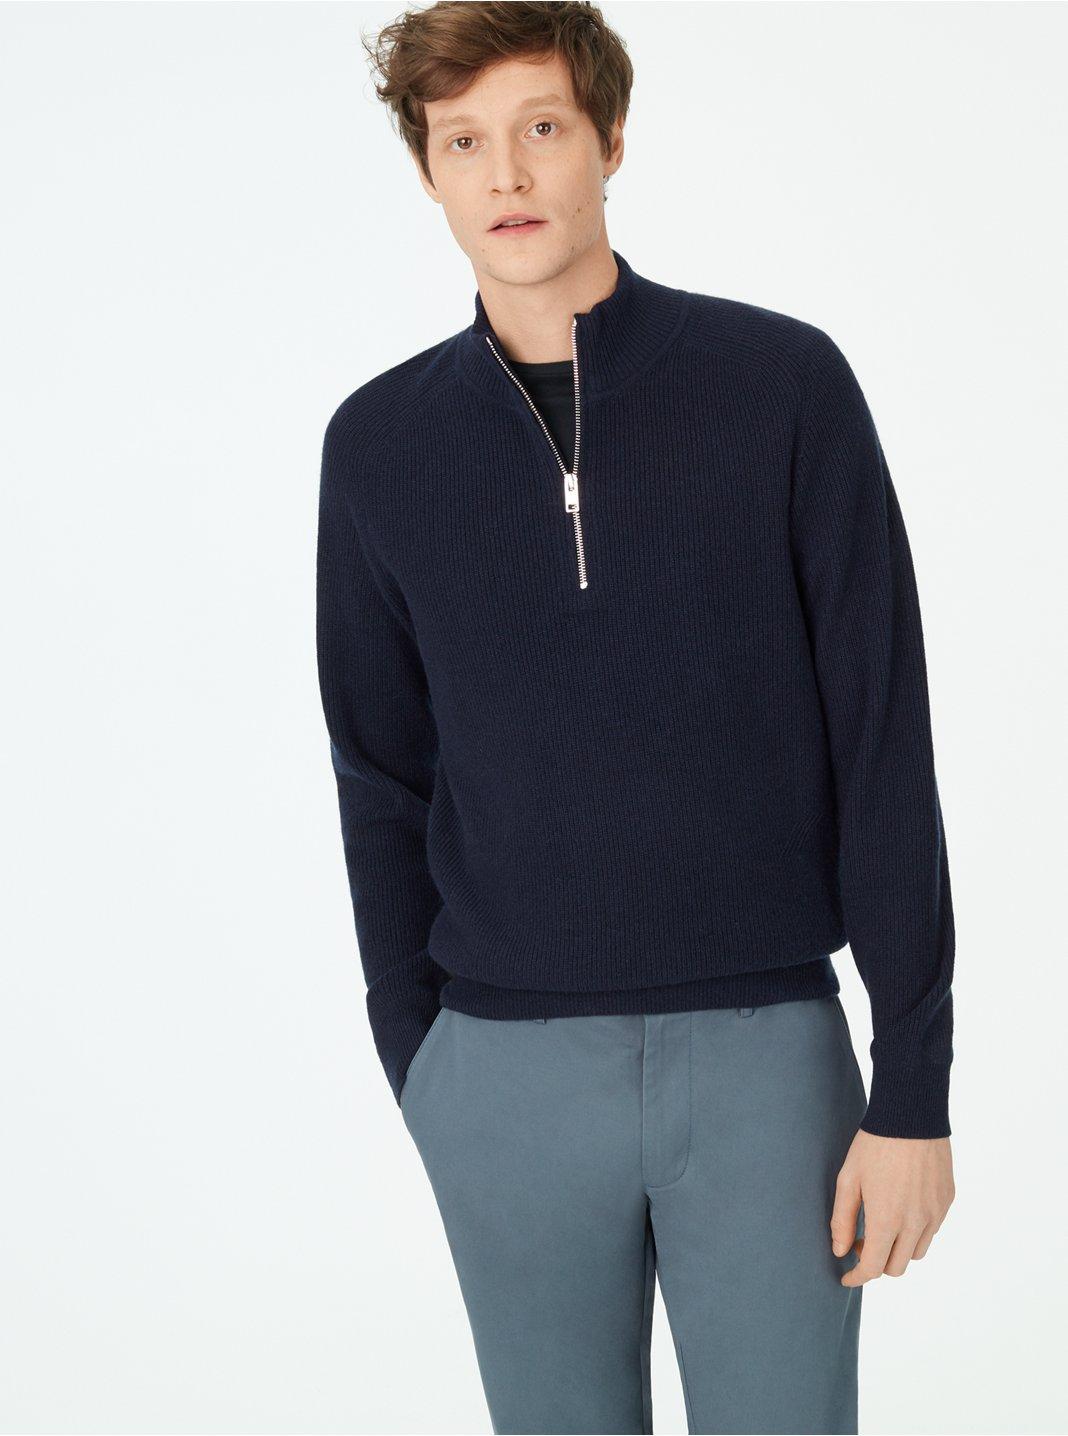 Cashmere Quarter-Zip Sweater